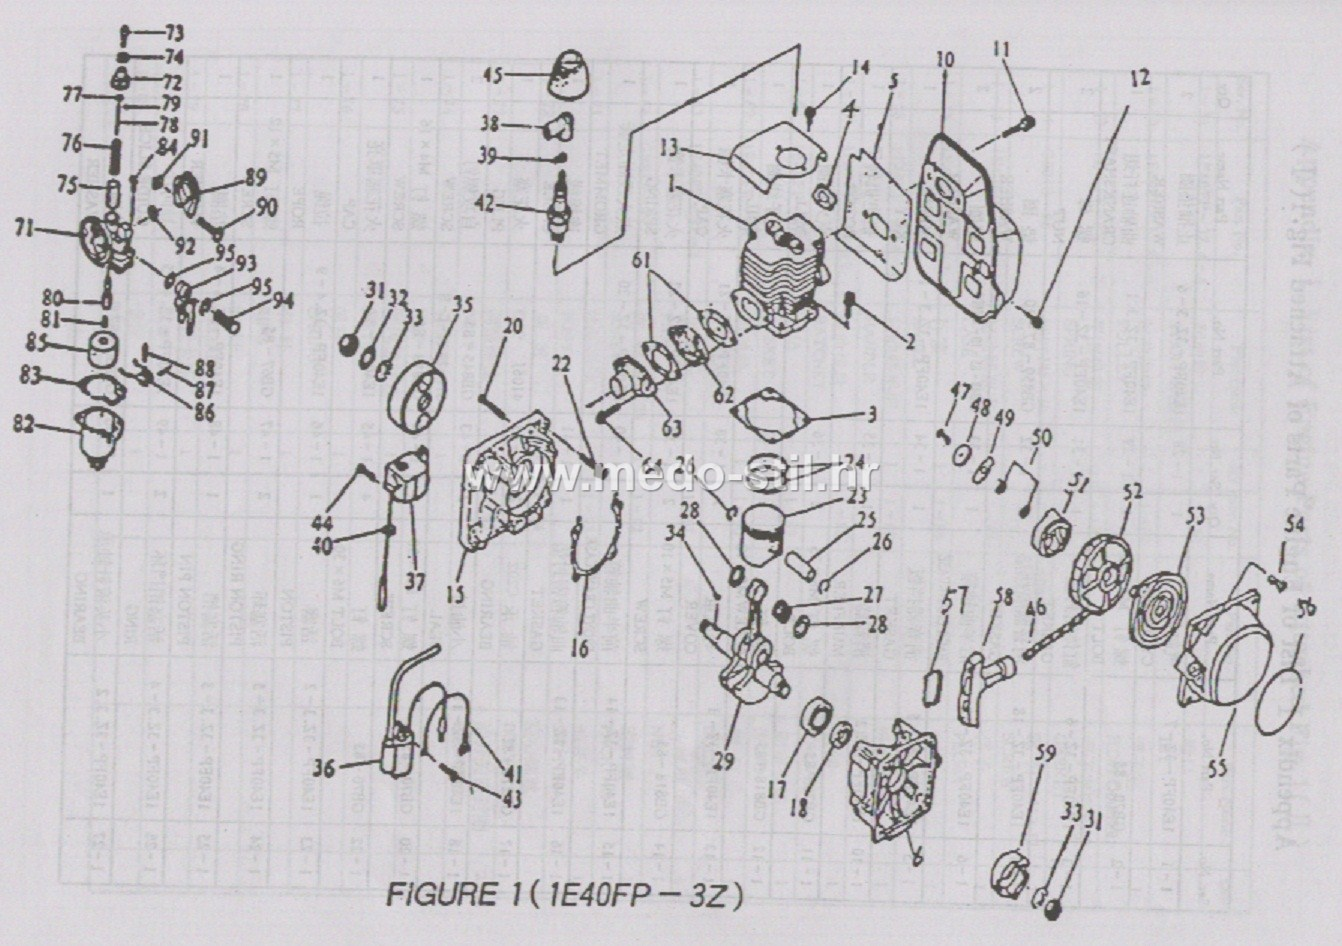 switchboard wiring diagram nz